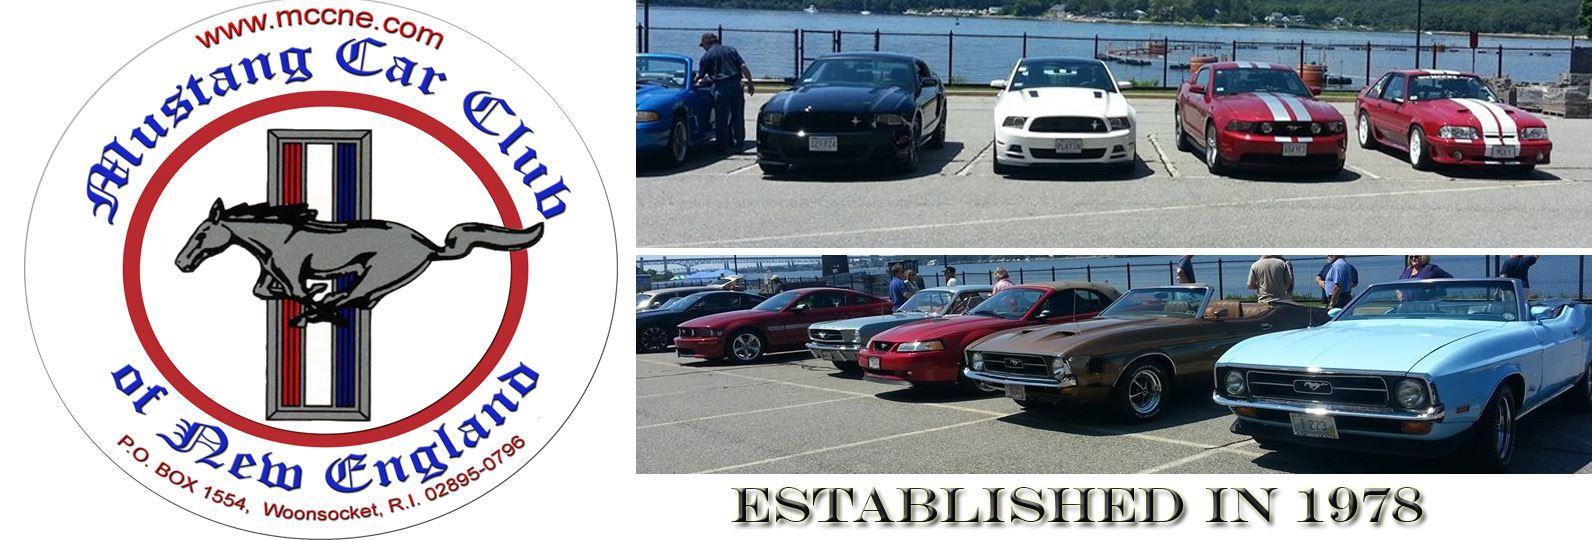 New Hampshire Mustang Club - Event Calendar